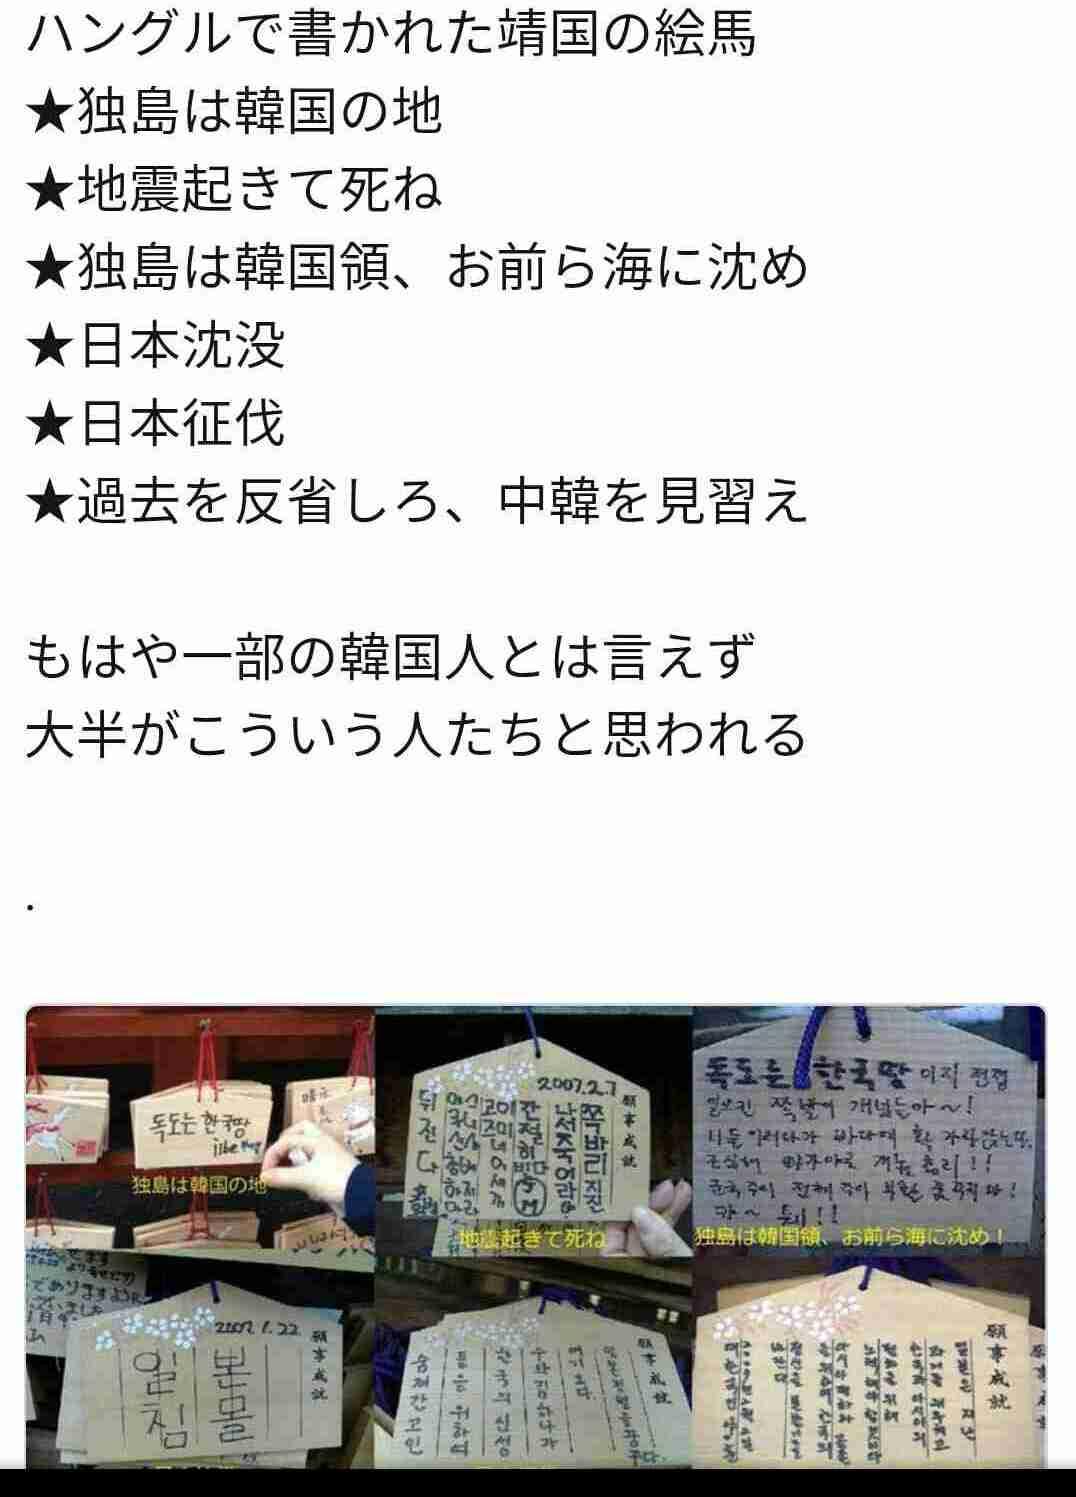 RADWIMPSの「HINOMARU」騒動、抗議集会に発展か 告知の主催側「2度と歌わないこと求める」